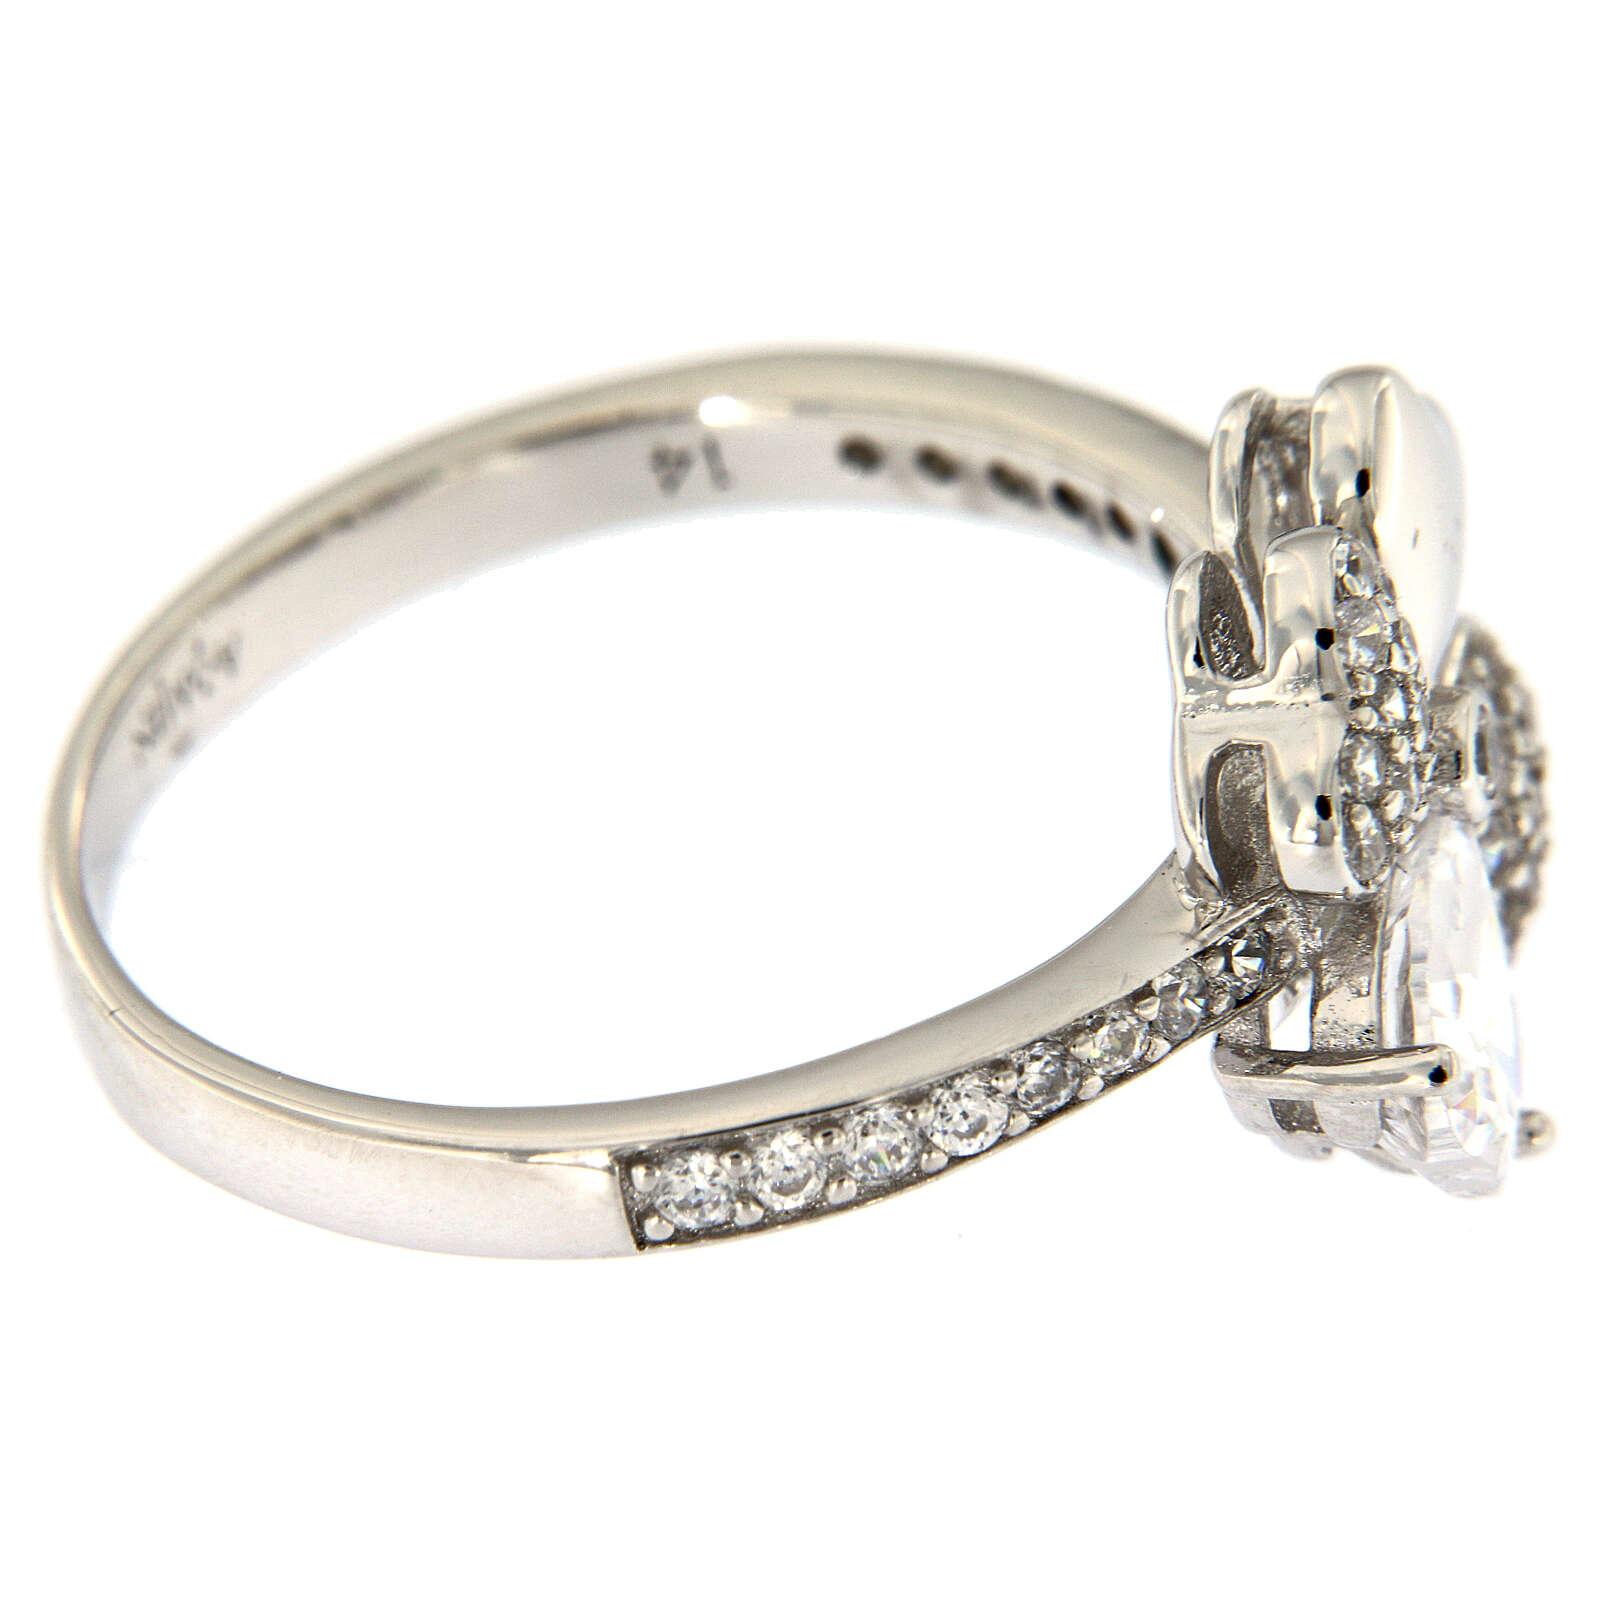 AMEN ring four-leaves clover white zircons 925 silver 3